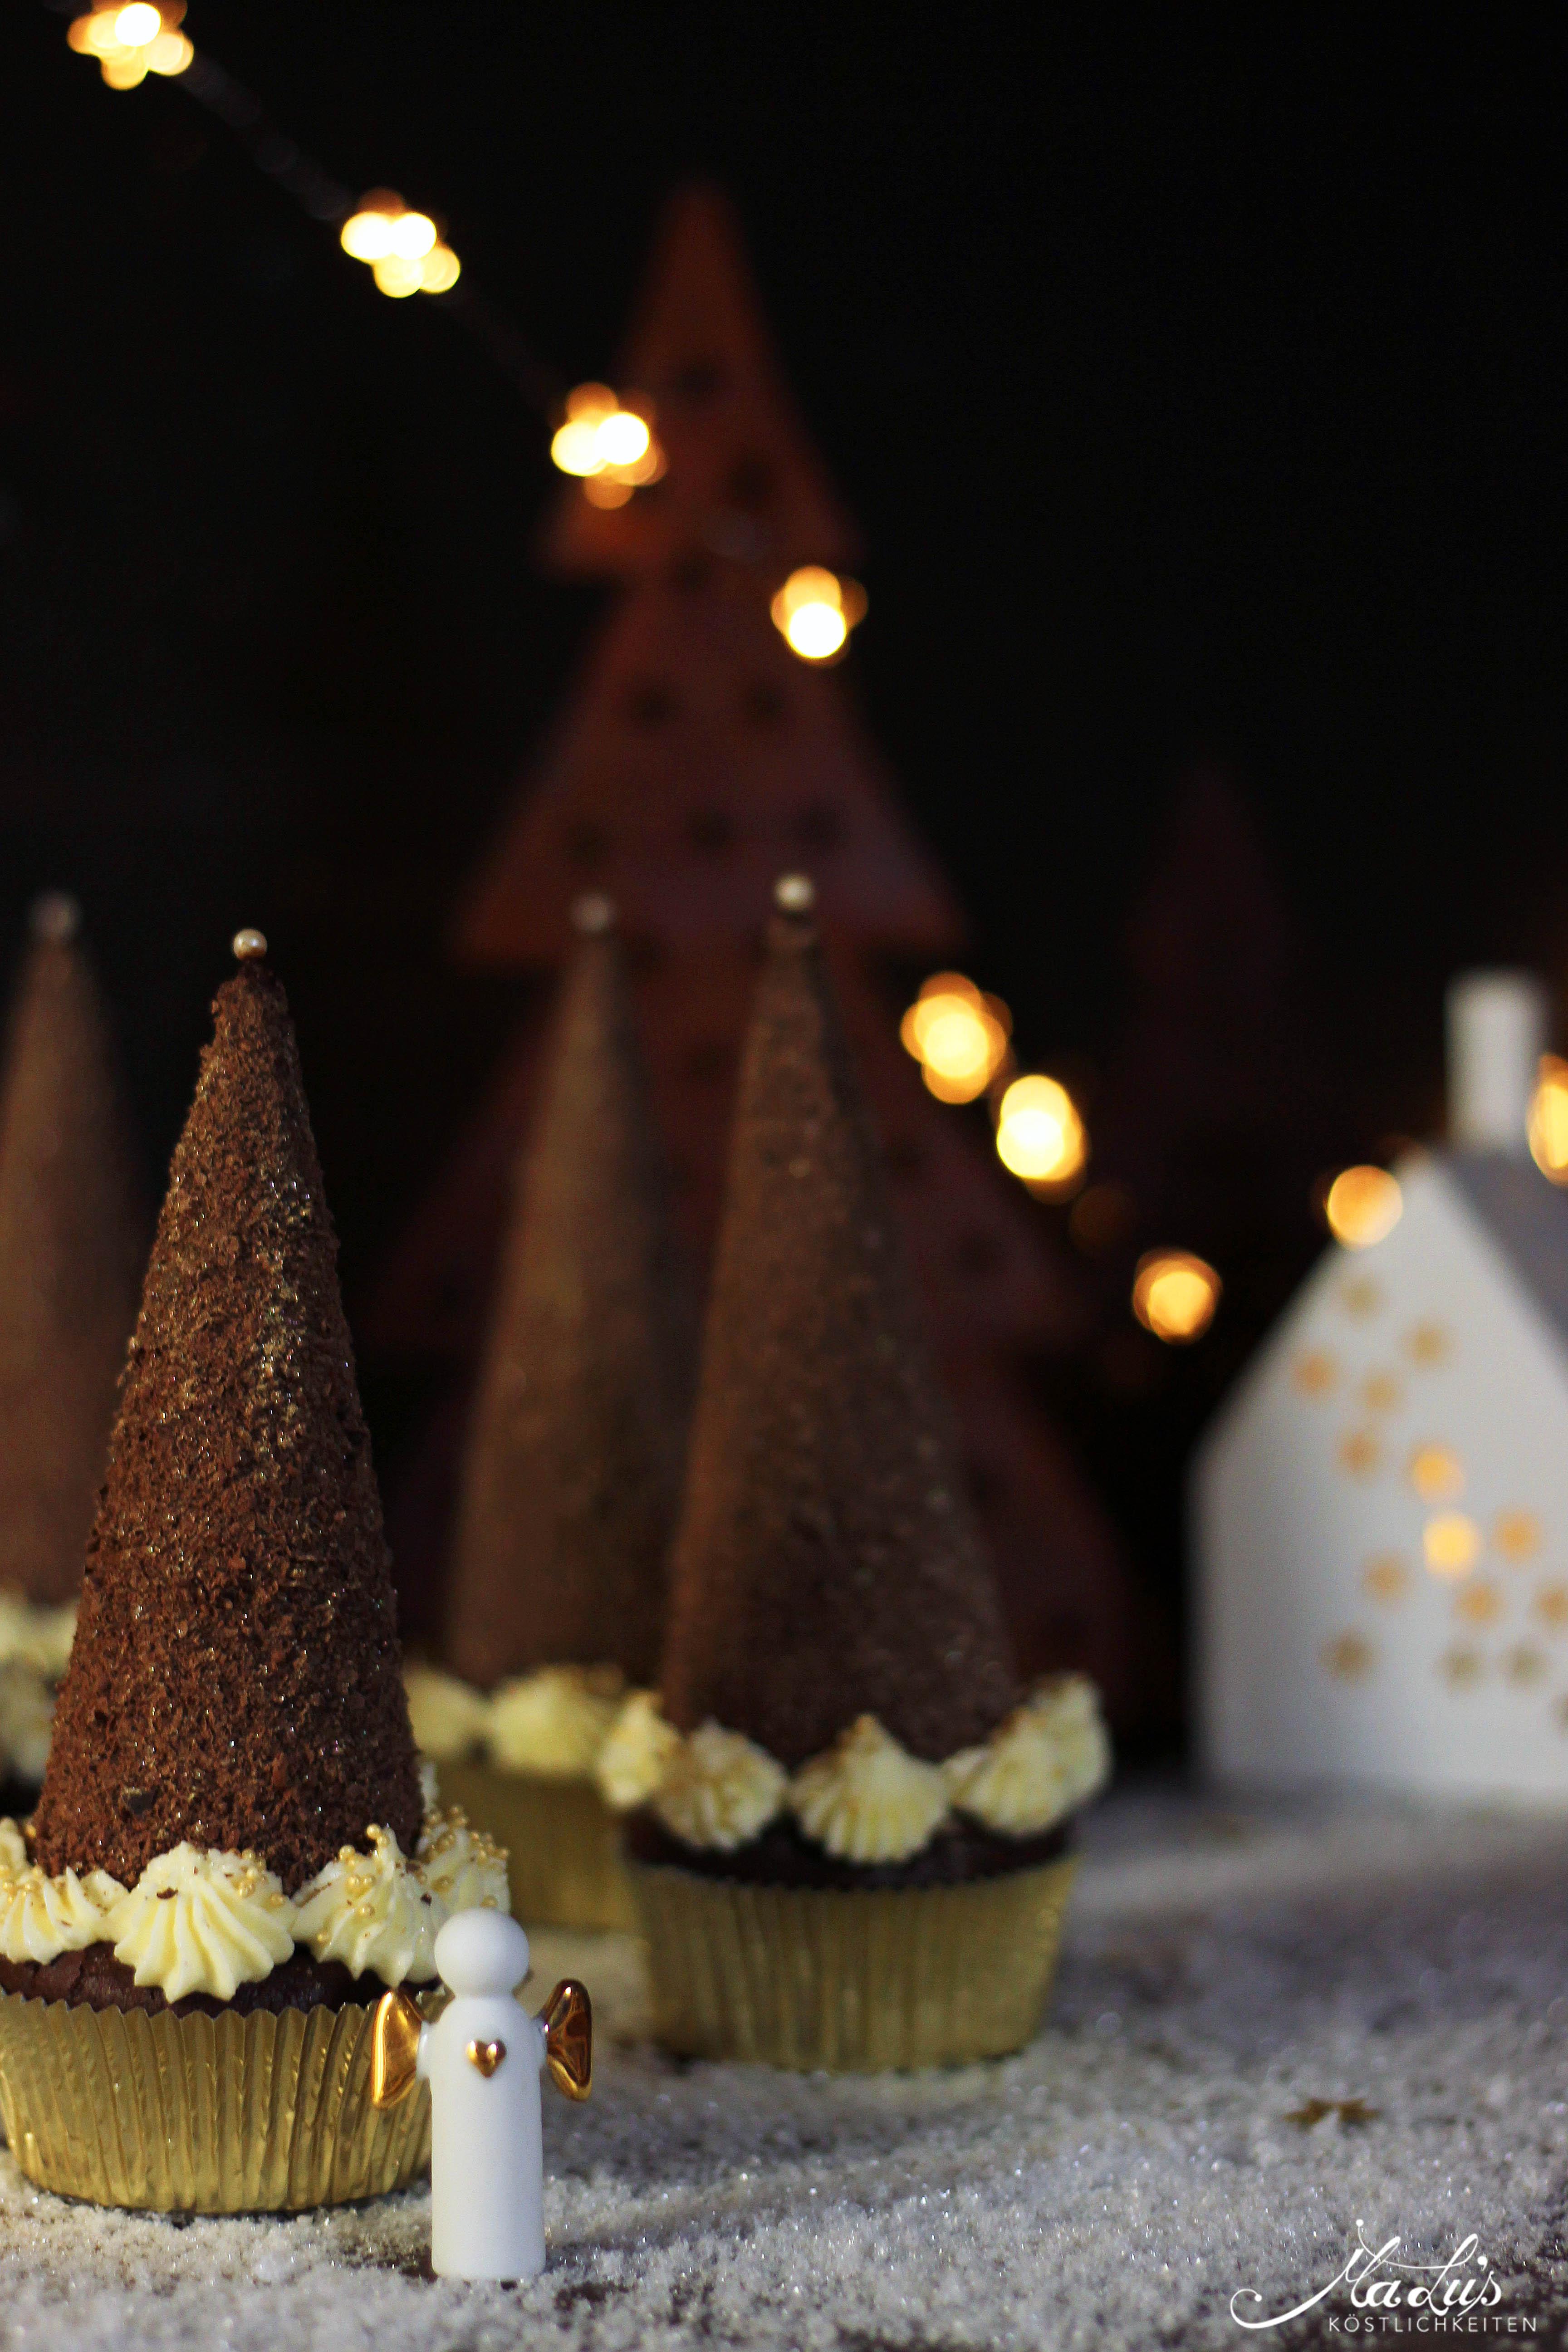 schoko-tannenbaum-cupcakes-4